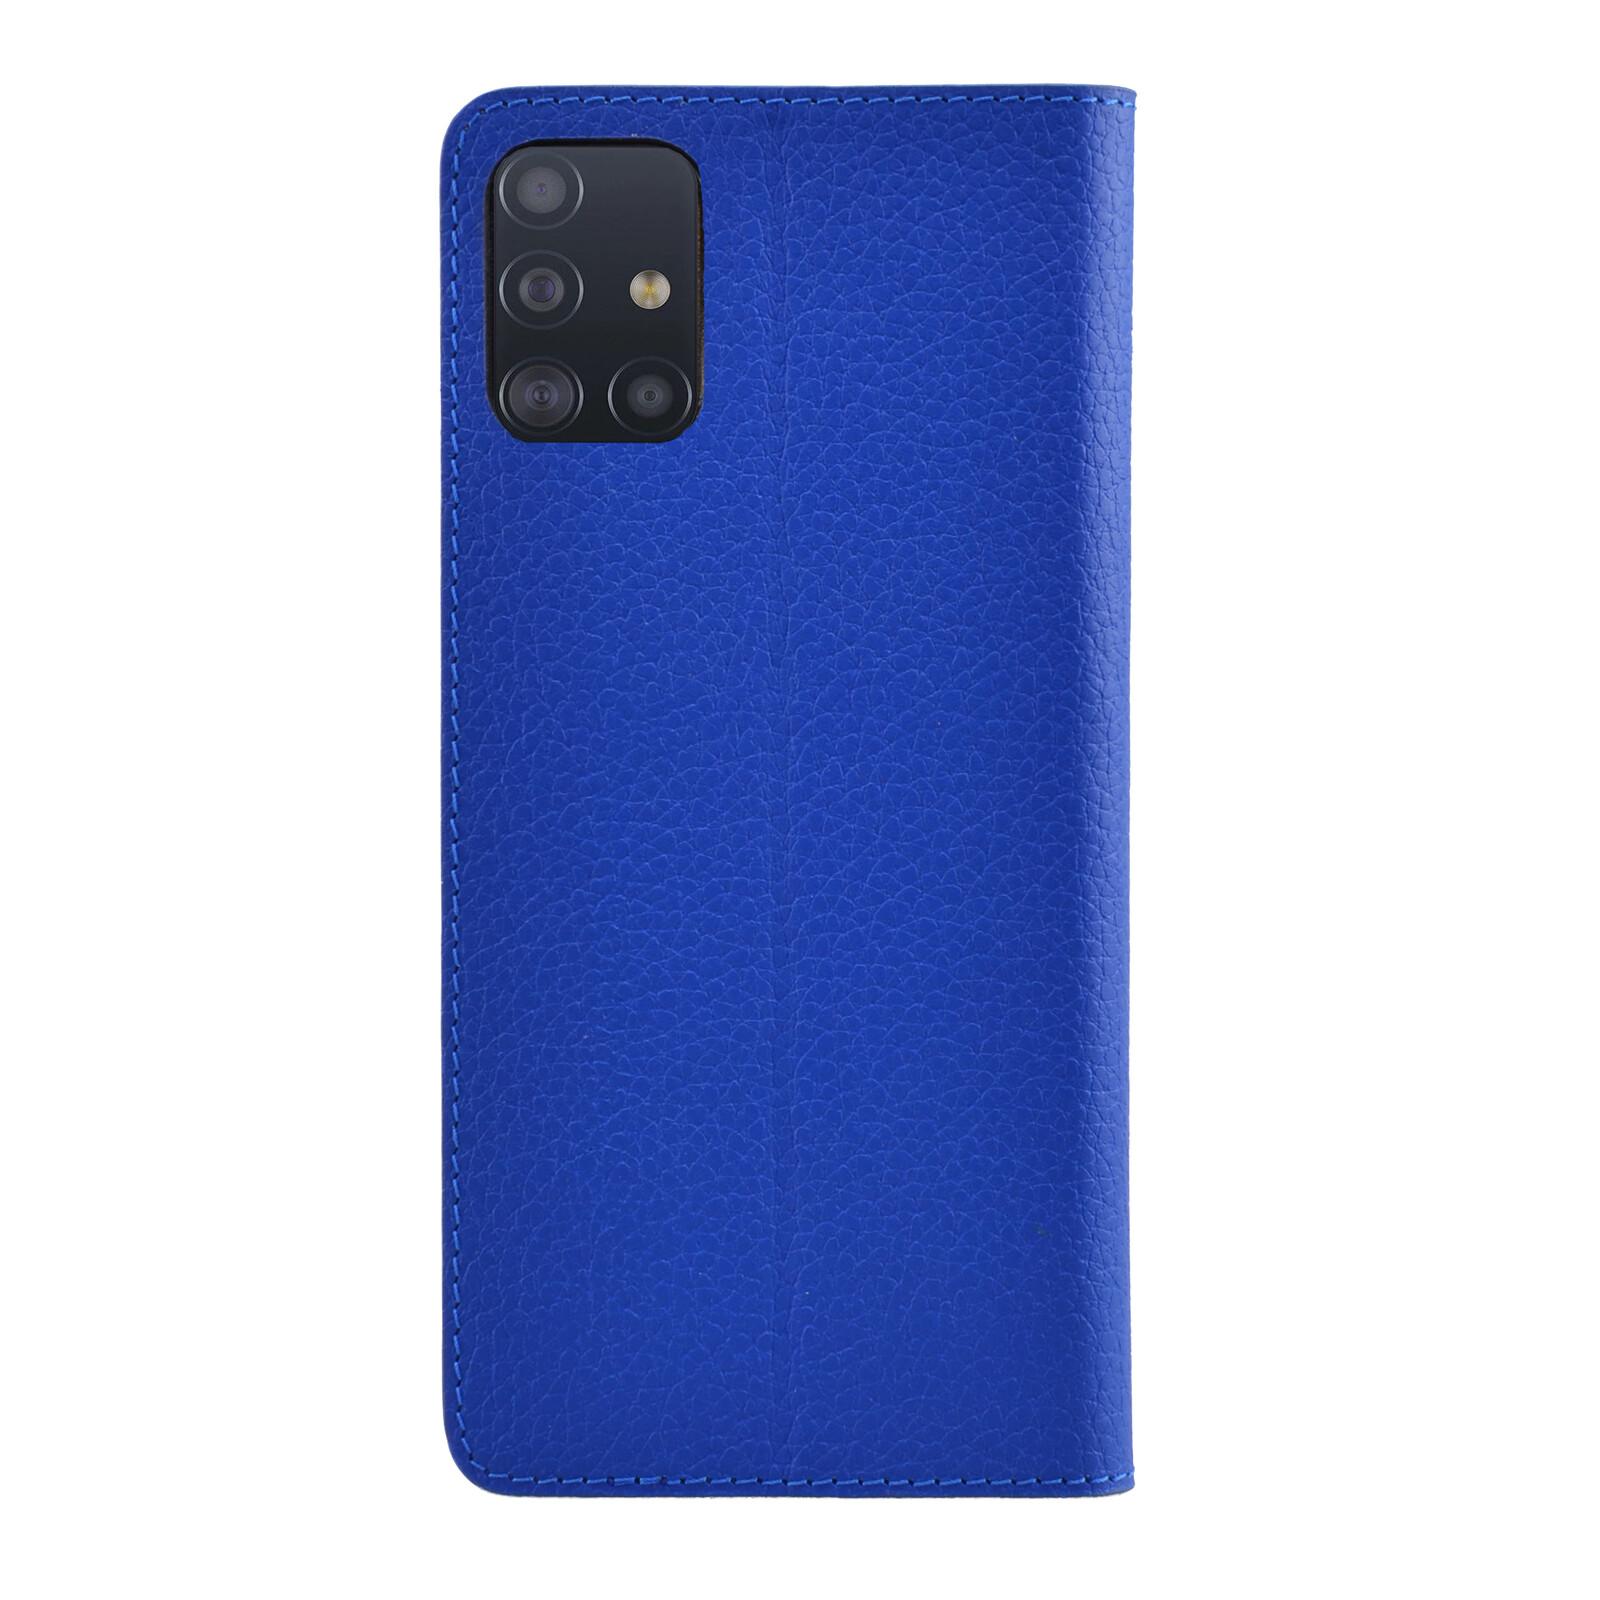 Galeli Booktasche MARC Samsung Galaxy A71 classic blue